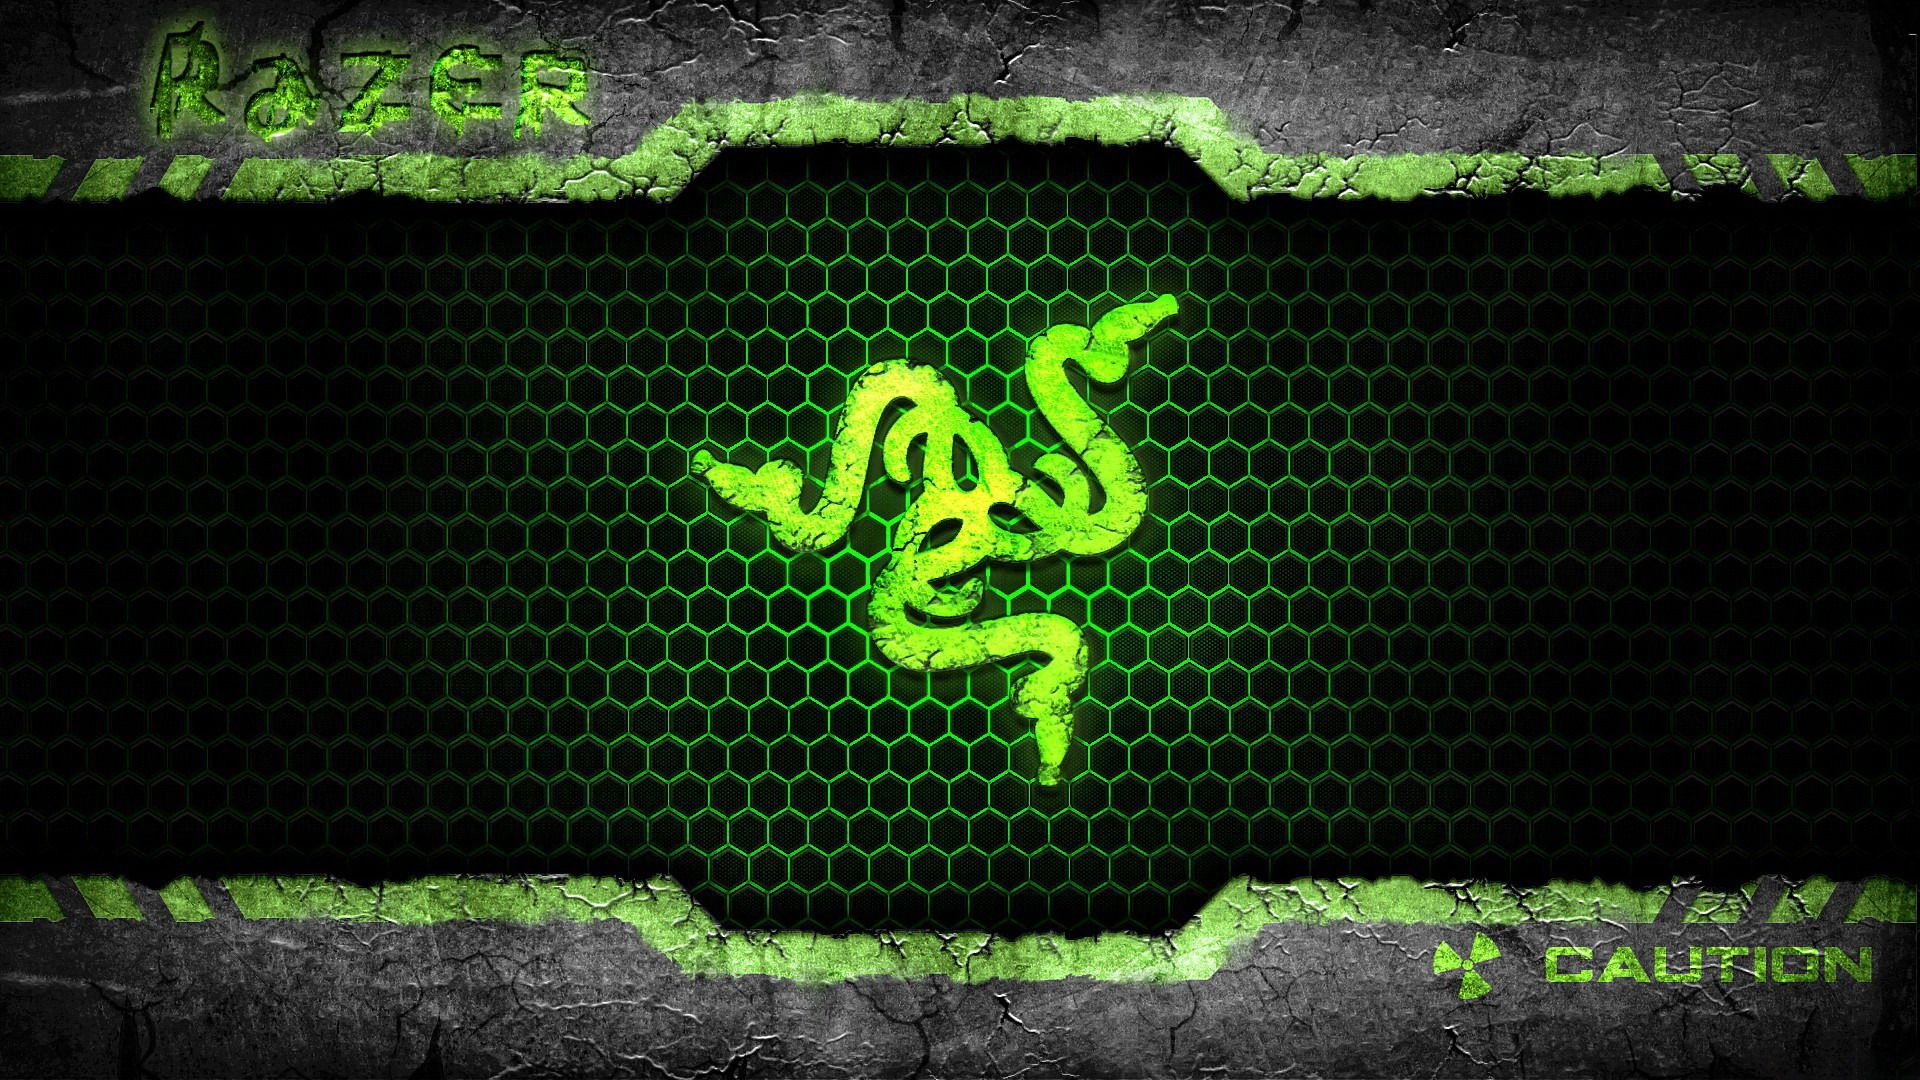 Wallpapers Razer Nature Green Logo ImageBankbiz 1920x1080